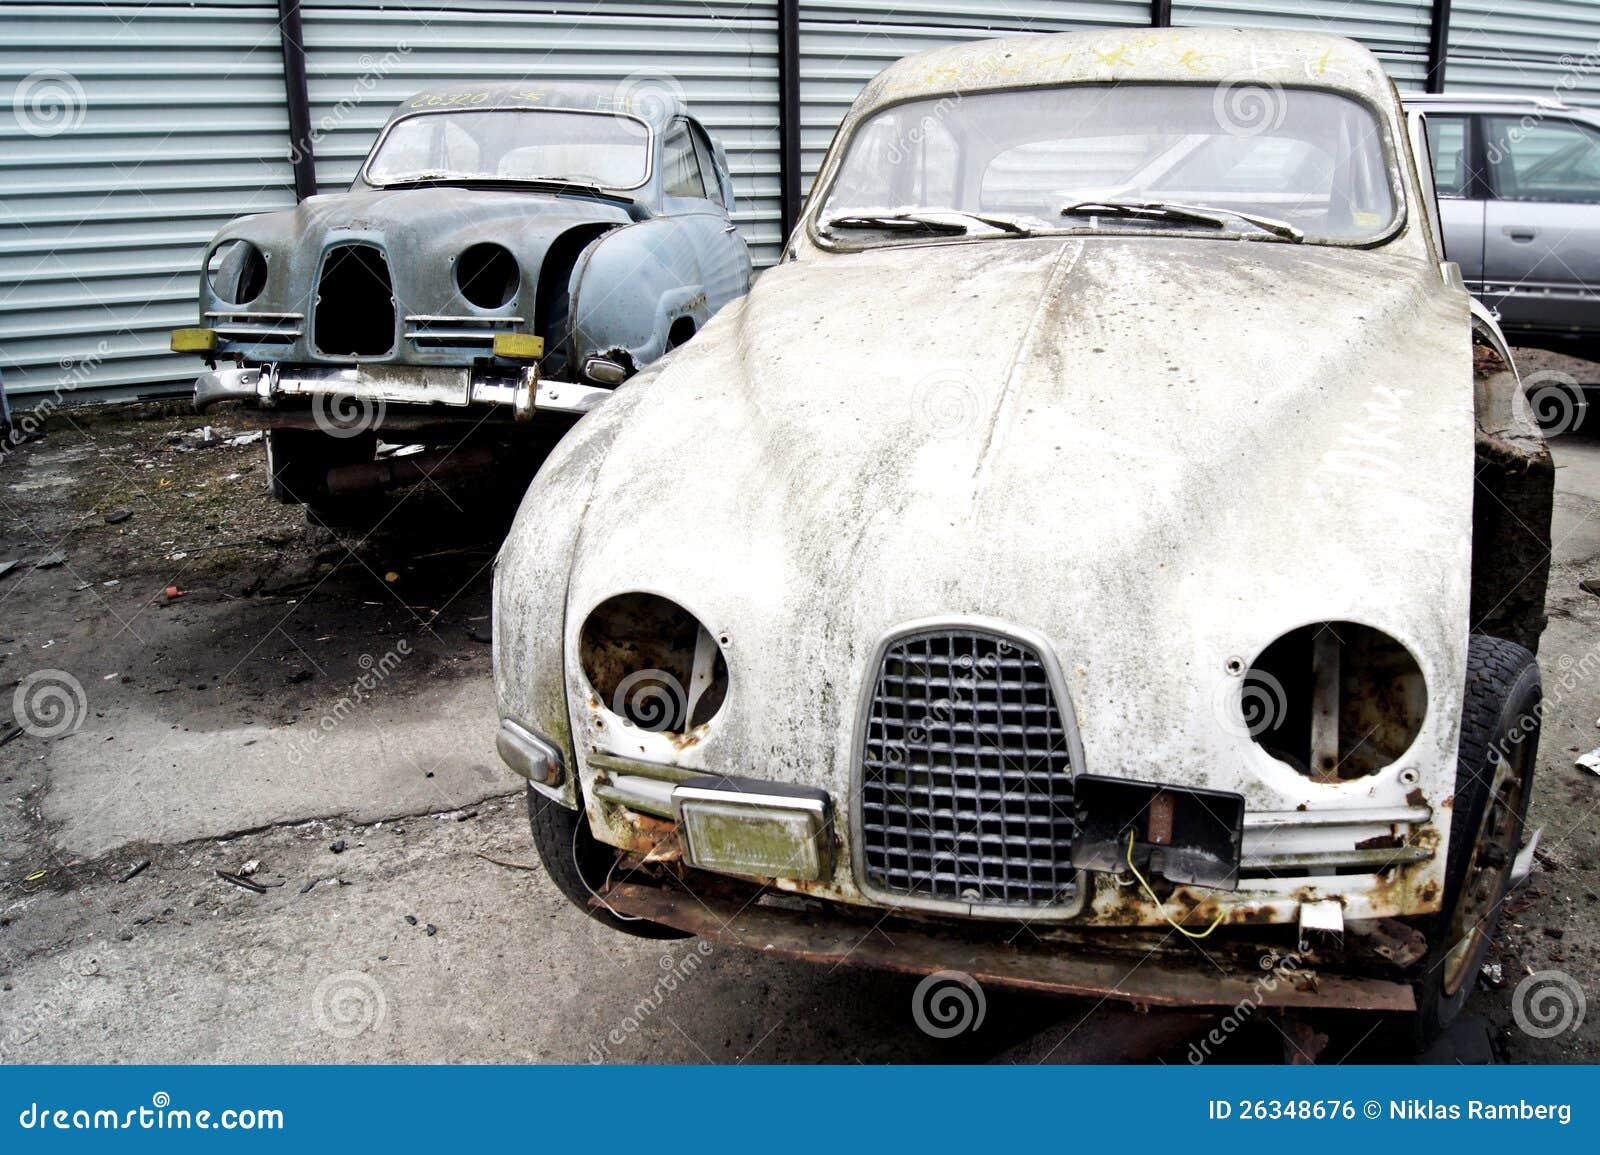 Swedish Classic Cars In The Junk Yard Stock Photo